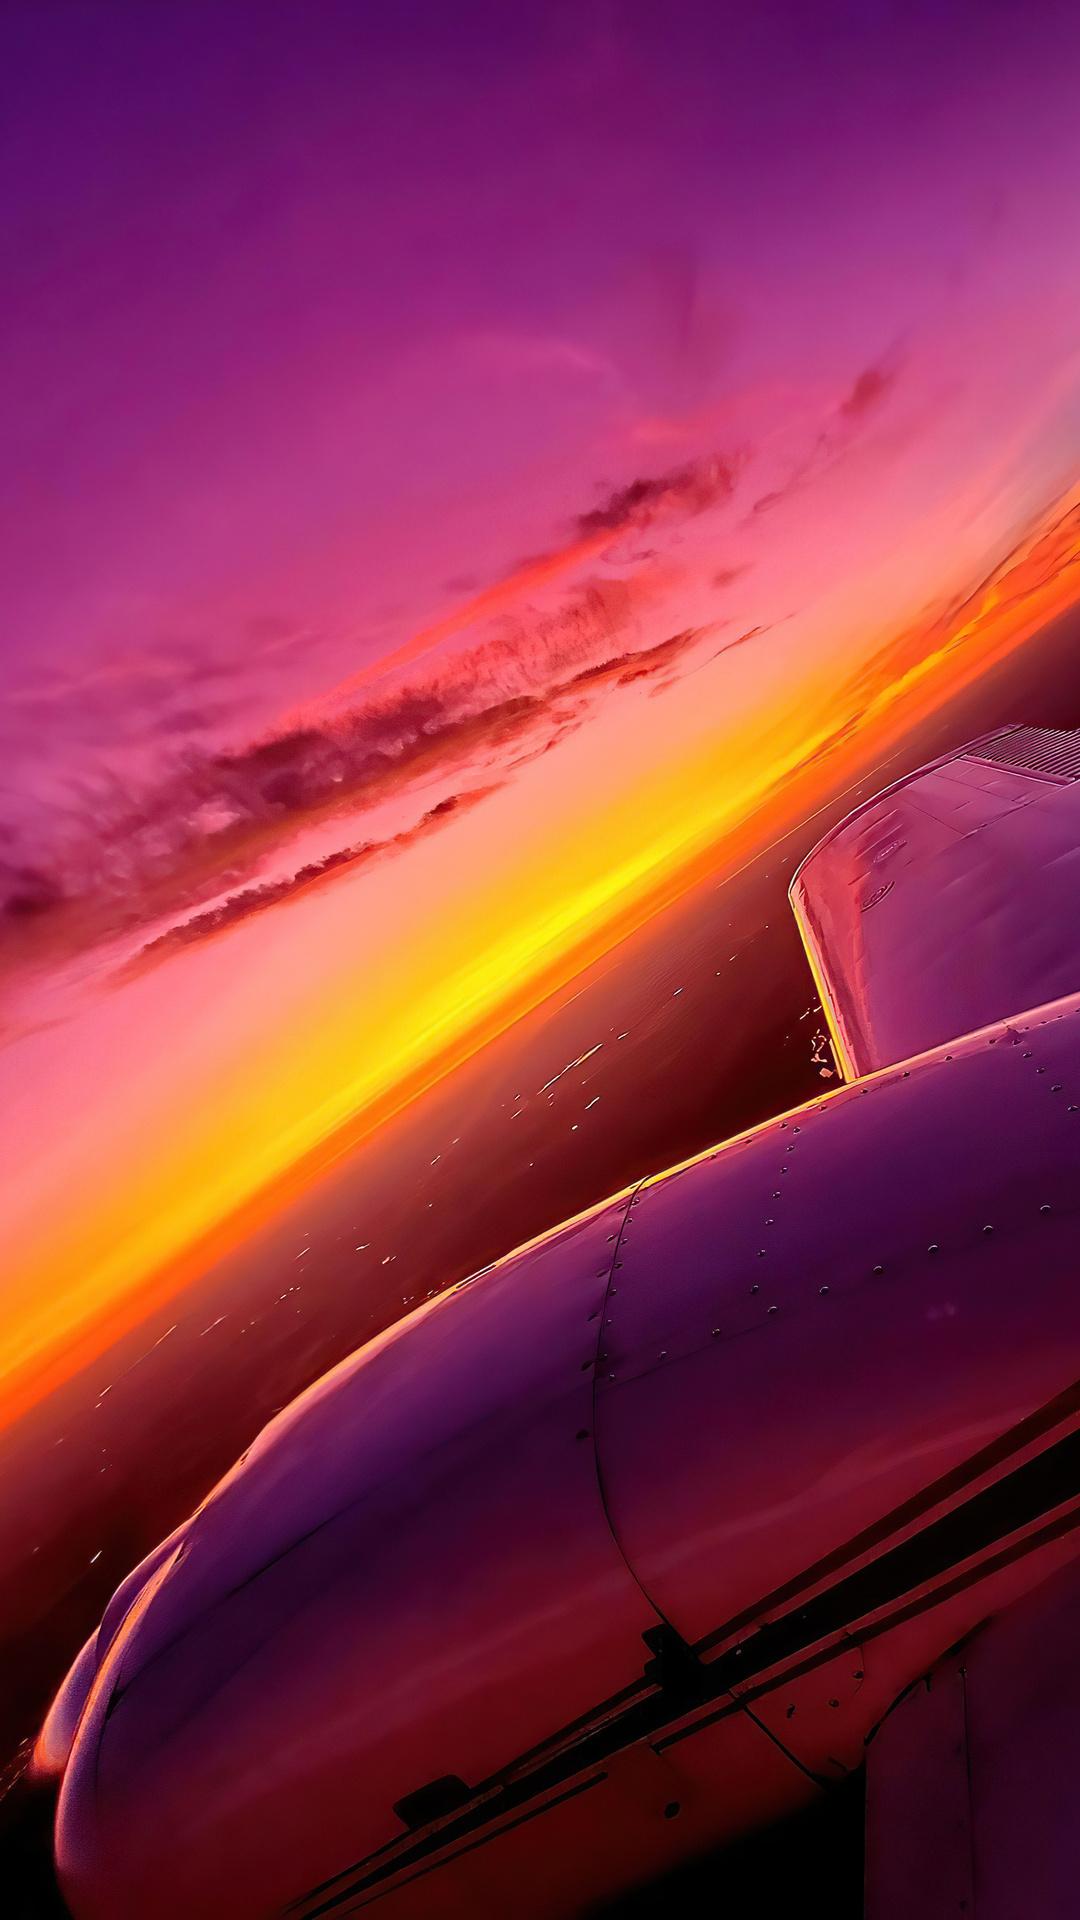 synthwave-sunset-plane-view-4k-ce.jpg